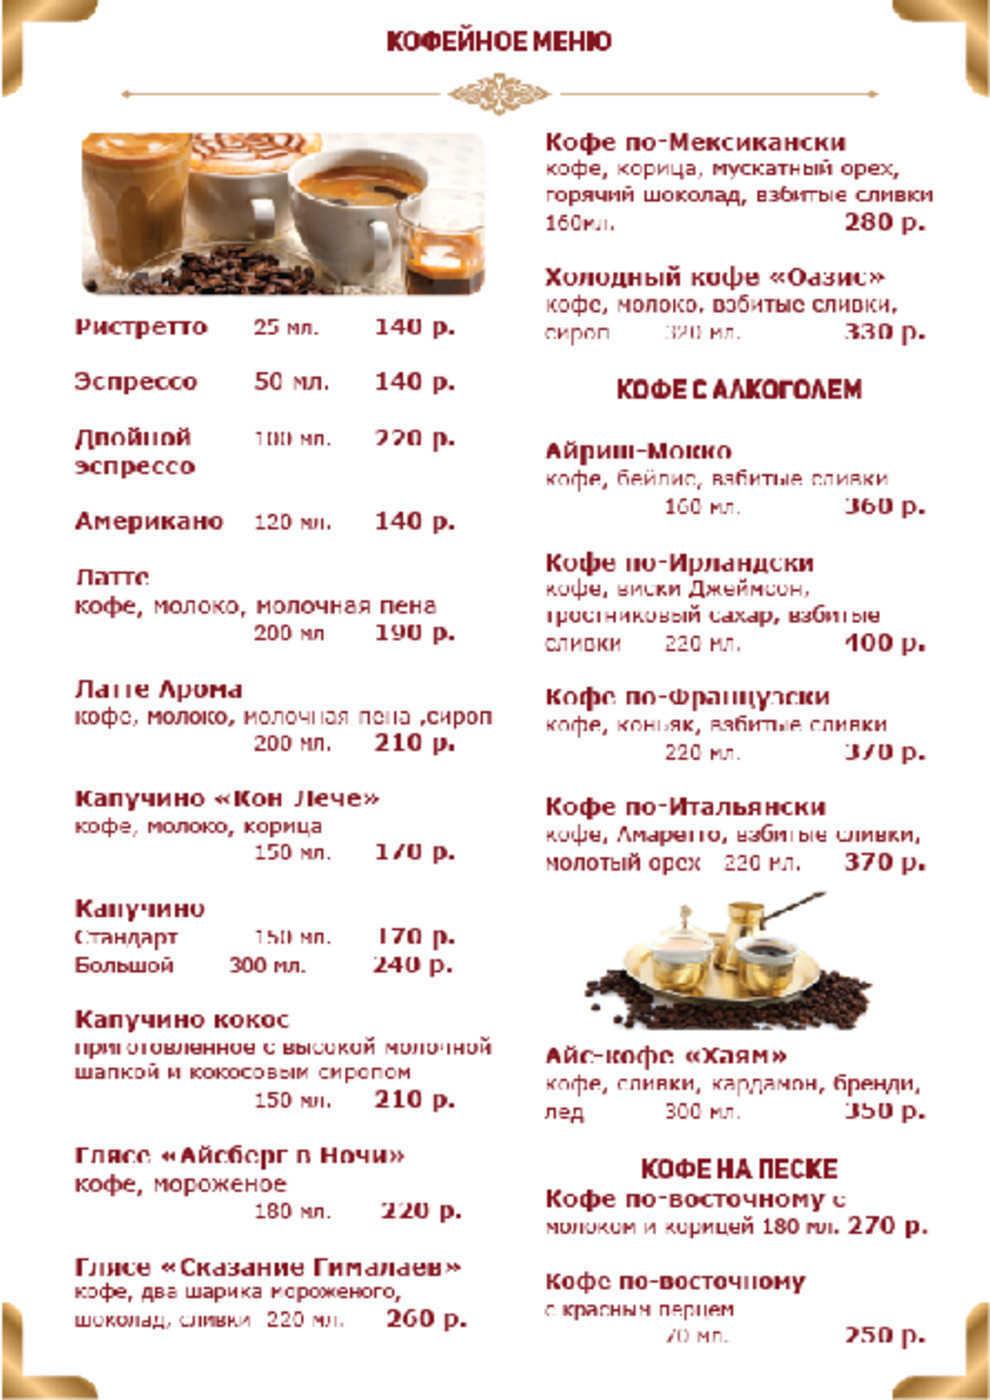 Меню кафе Рубаи на набережной реки Фонтанки фото 27